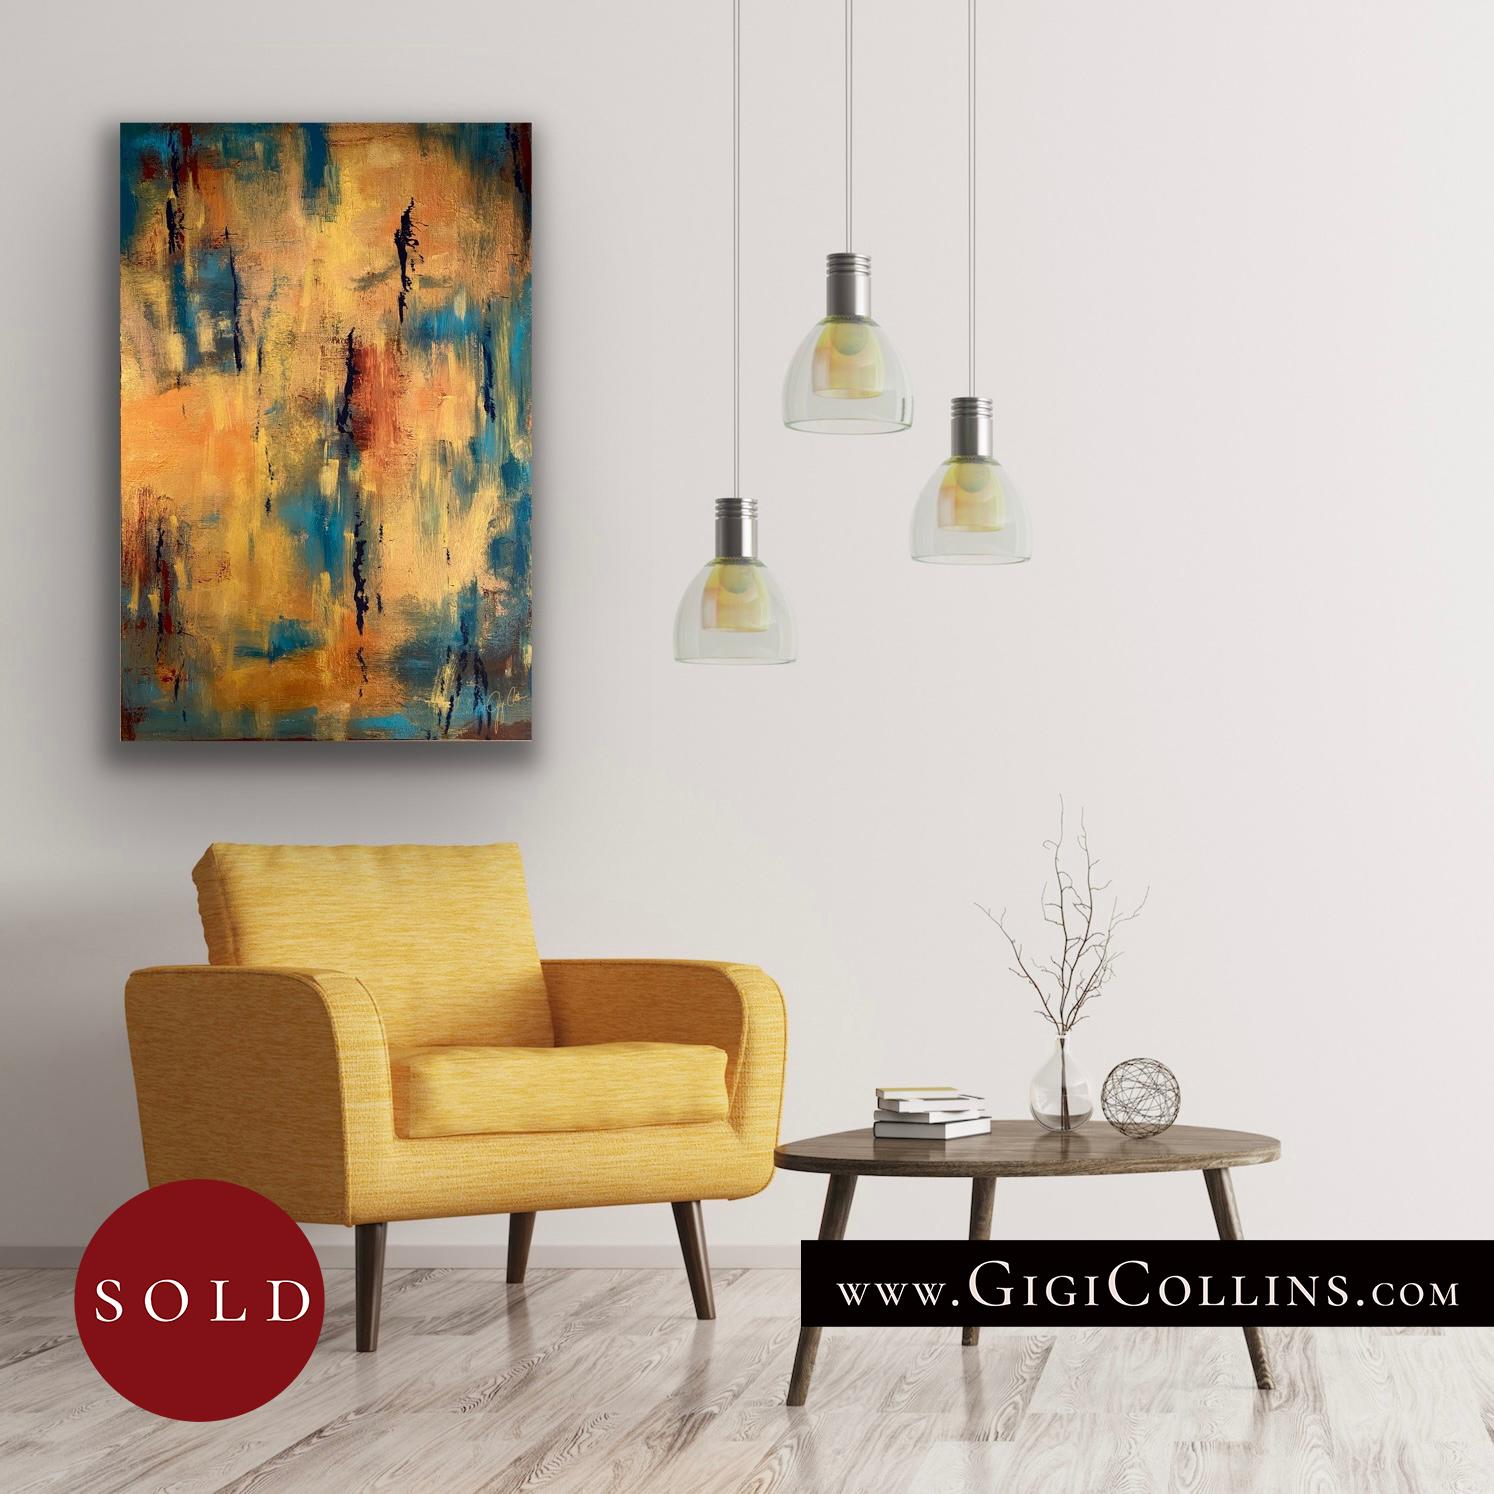 Miles sq ar wm 72 sold f9vens